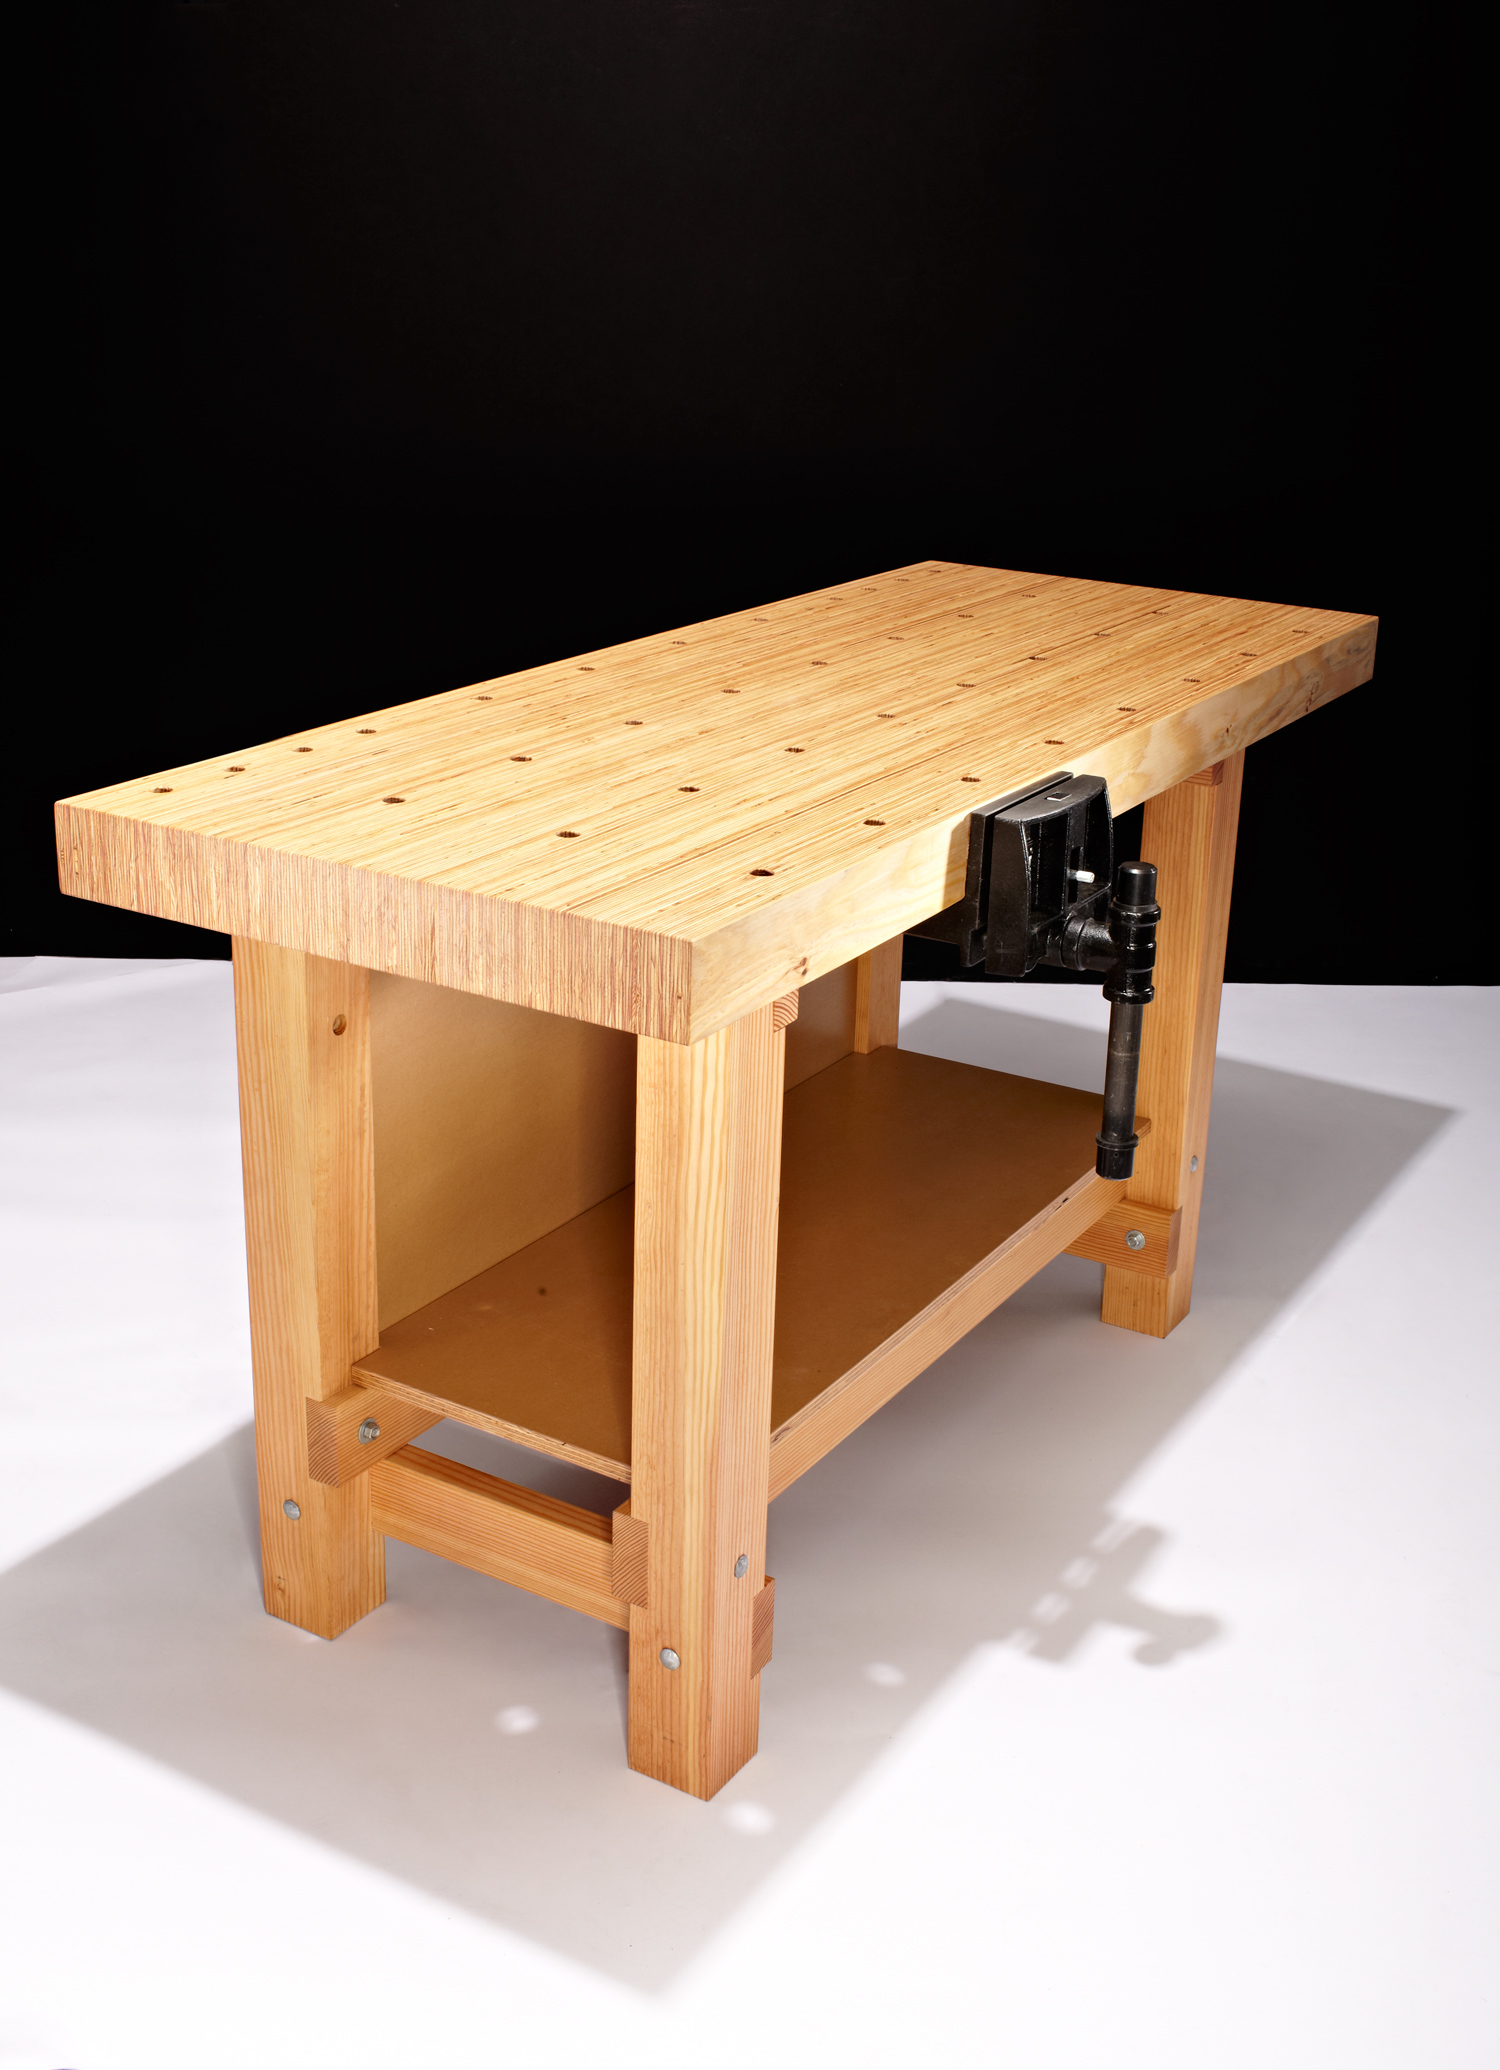 Foyer Bench Popular Mechanics : How to build a workbench